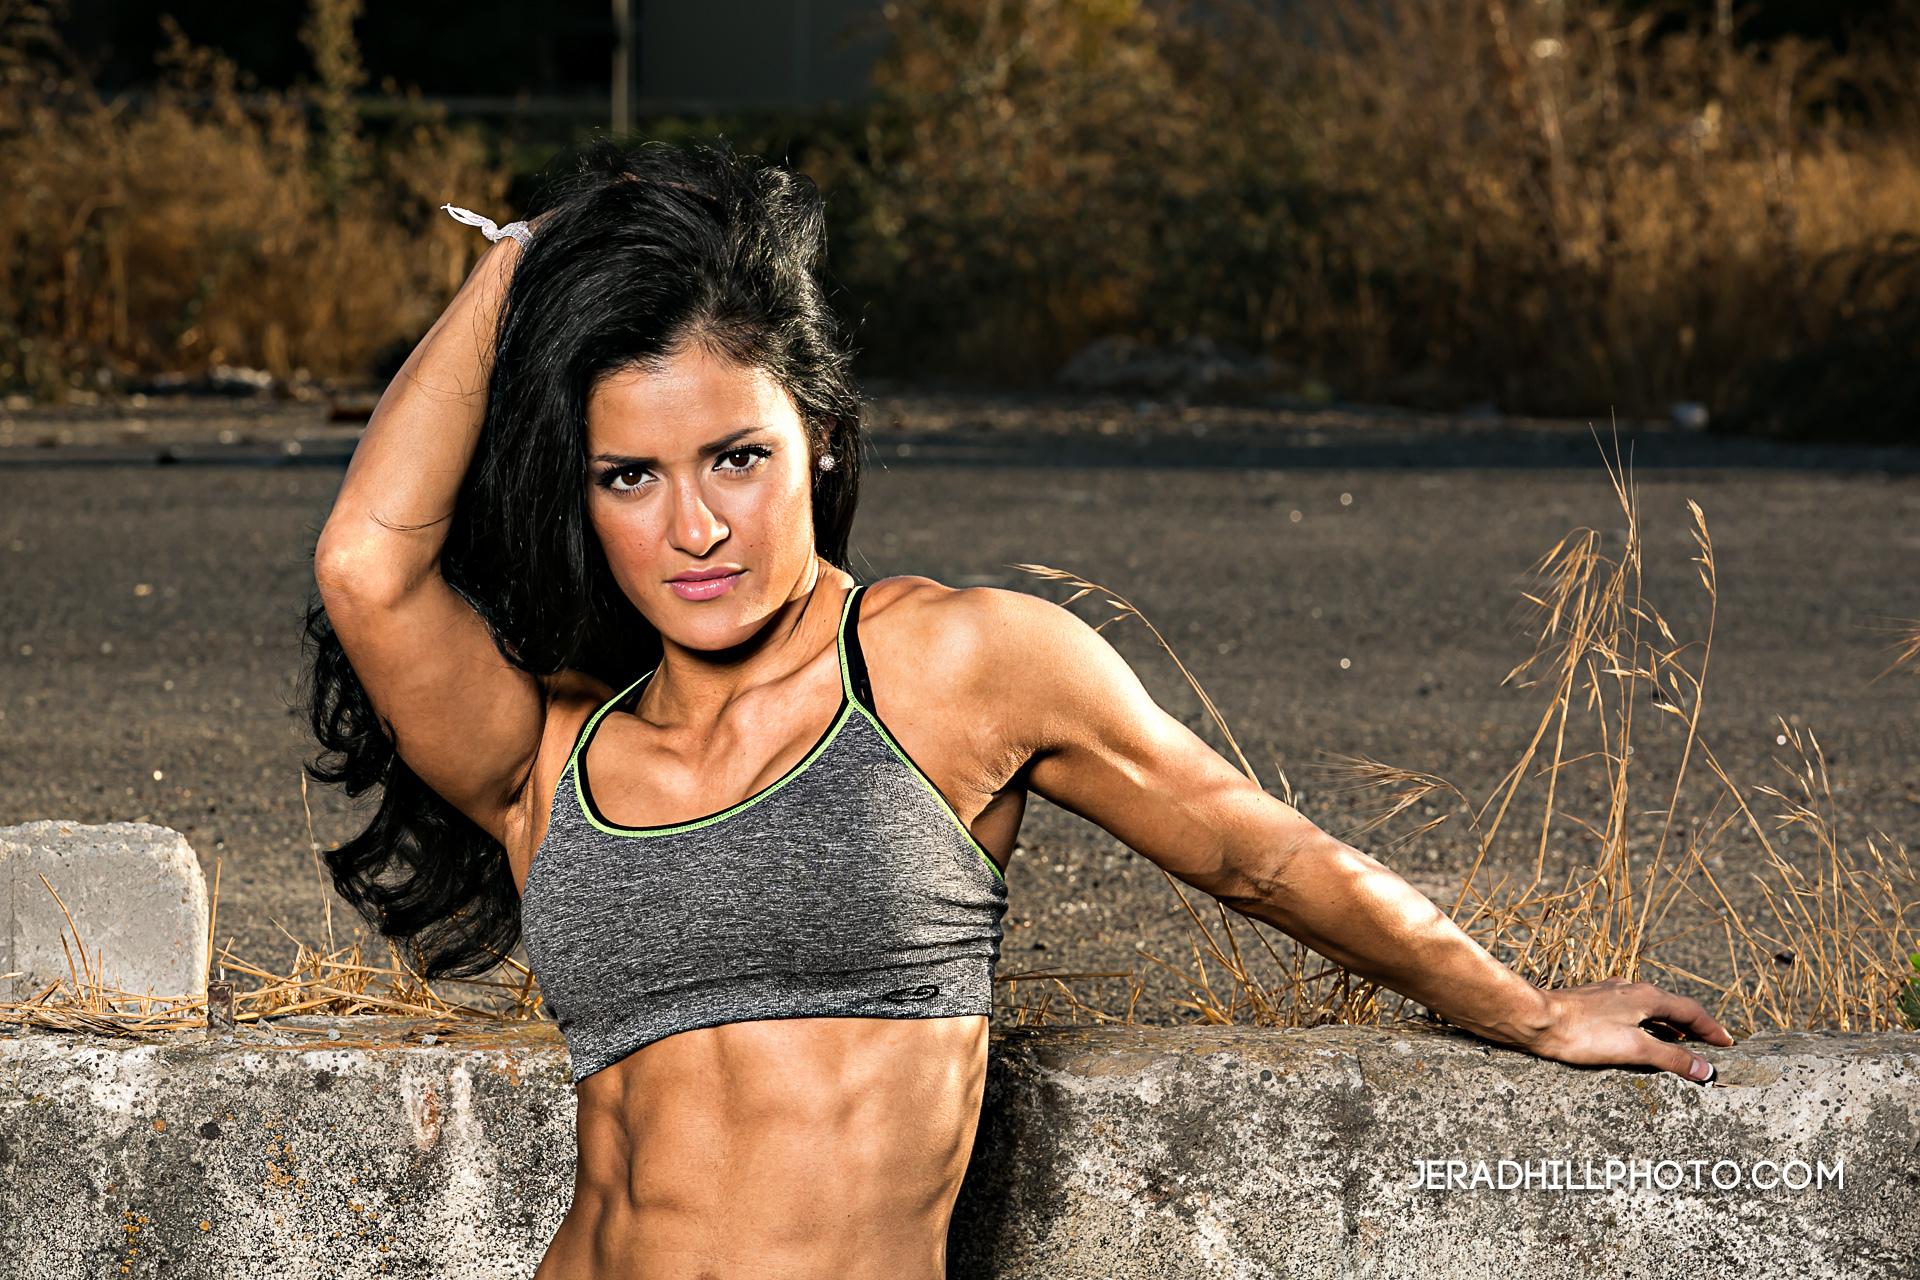 Jessica Arevalo